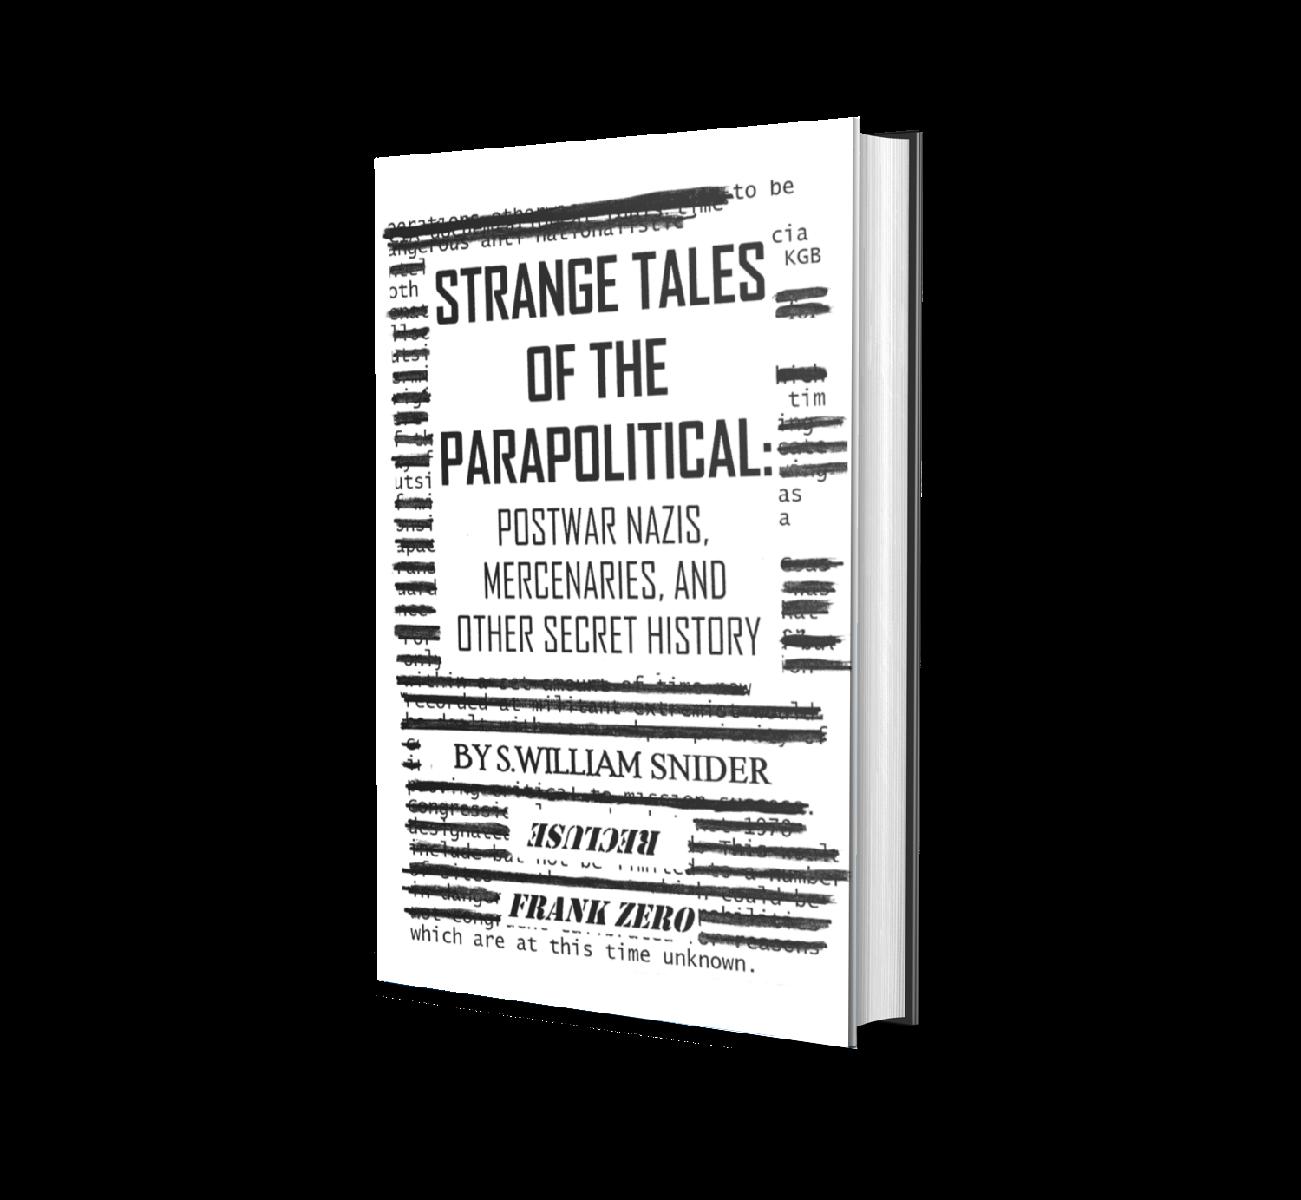 books crime corruption fascism Nazi military politics mercenaries history